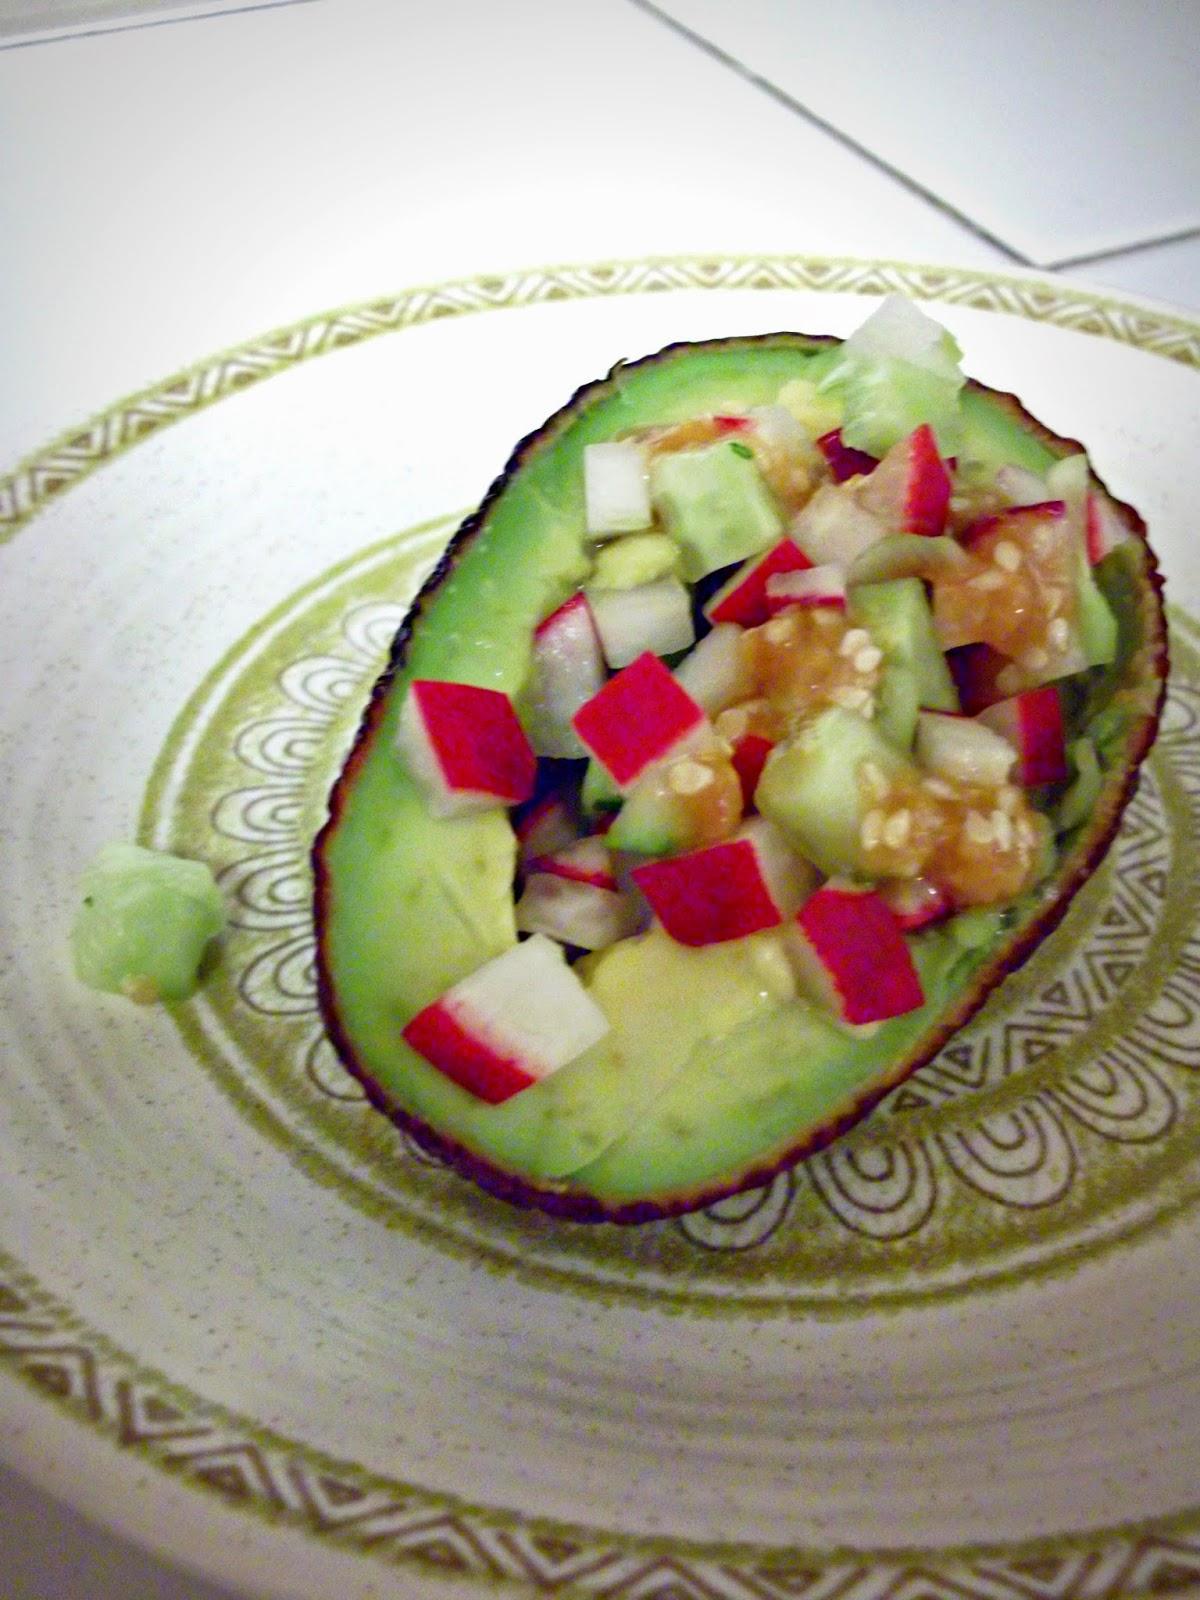 Julia S Vegan Kitchen Avocado Cup Salad With Cucumbers Radishes